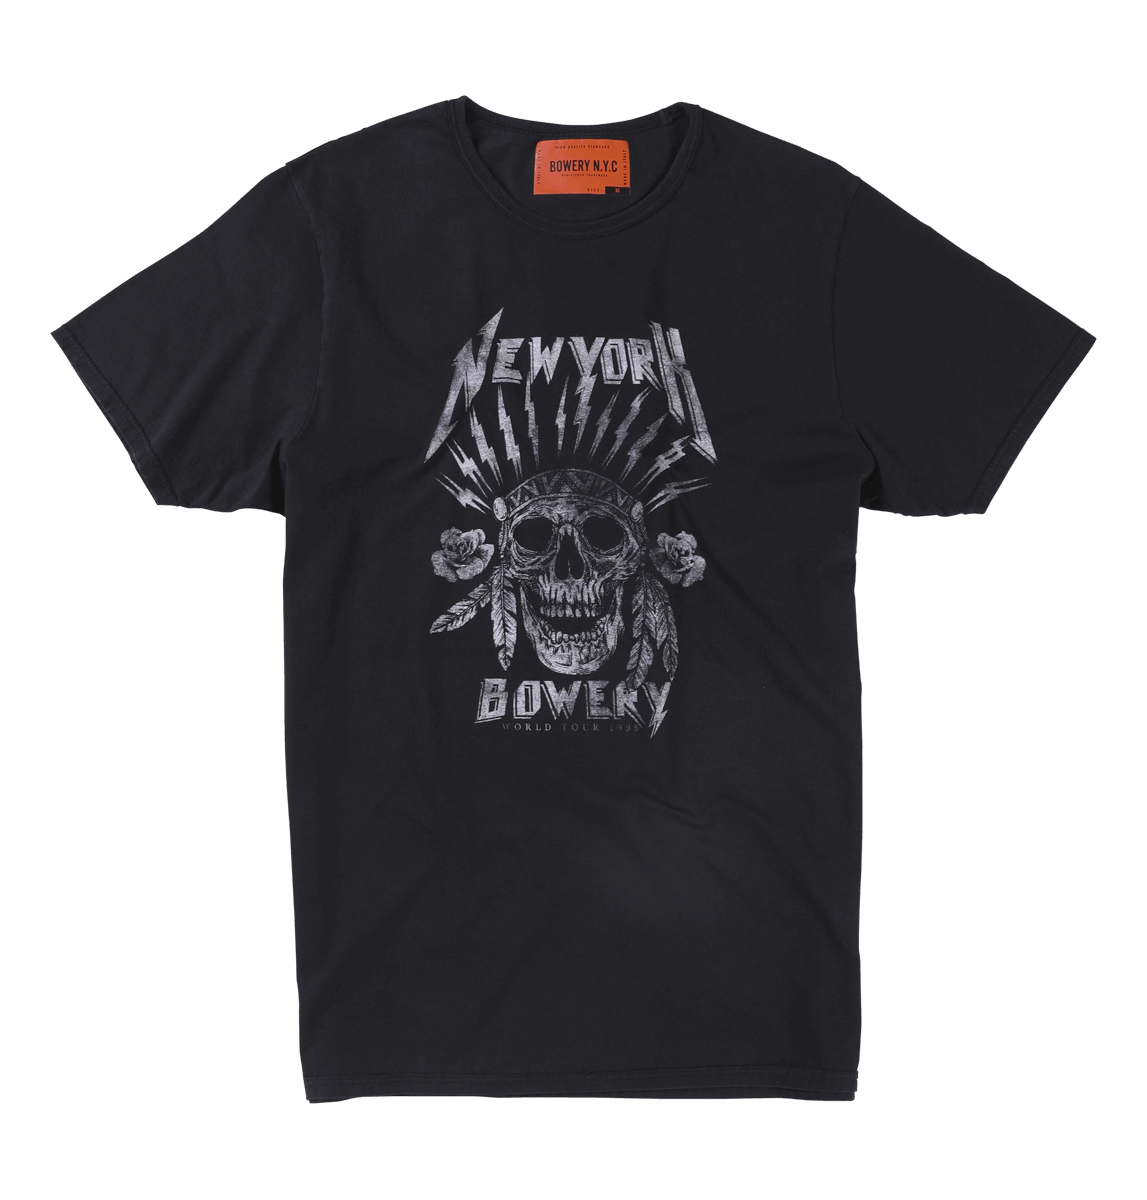 Bowery NYC - New York Skull - Black